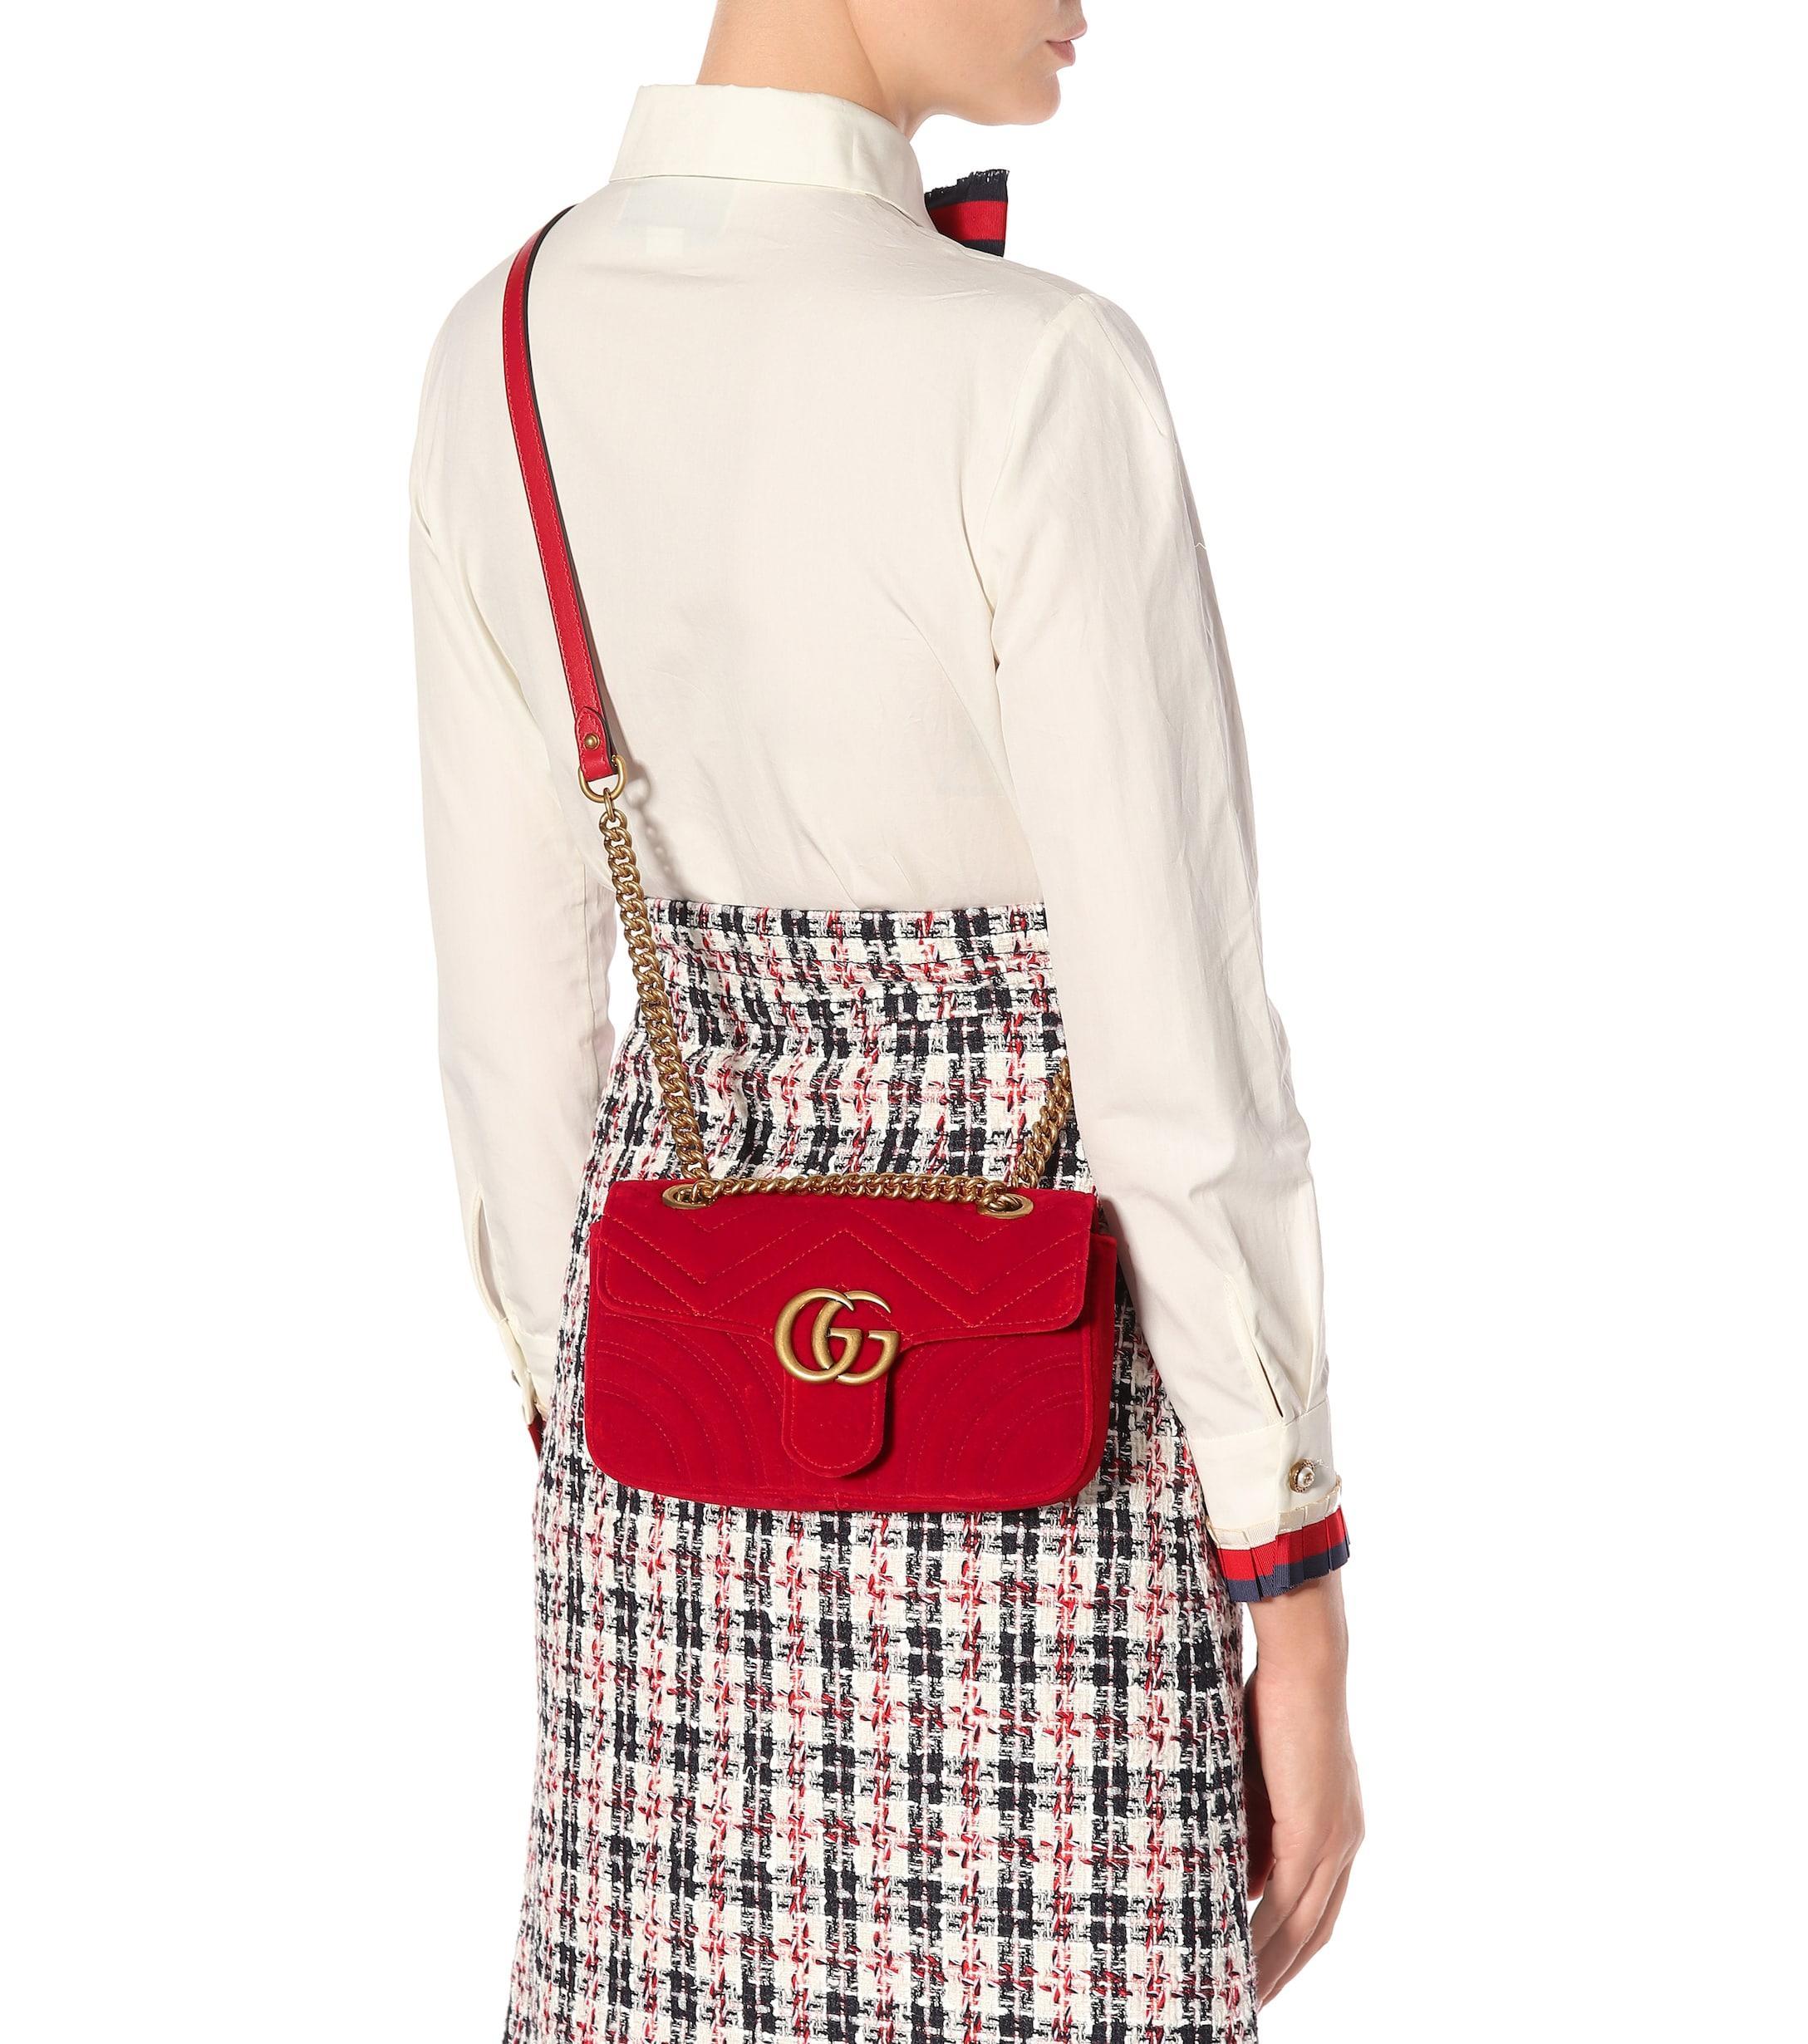 1759adbee97f32 Gucci - Red Mini Gg Marmont 2.0 Velvet Shoulder Bag - Lyst. View fullscreen